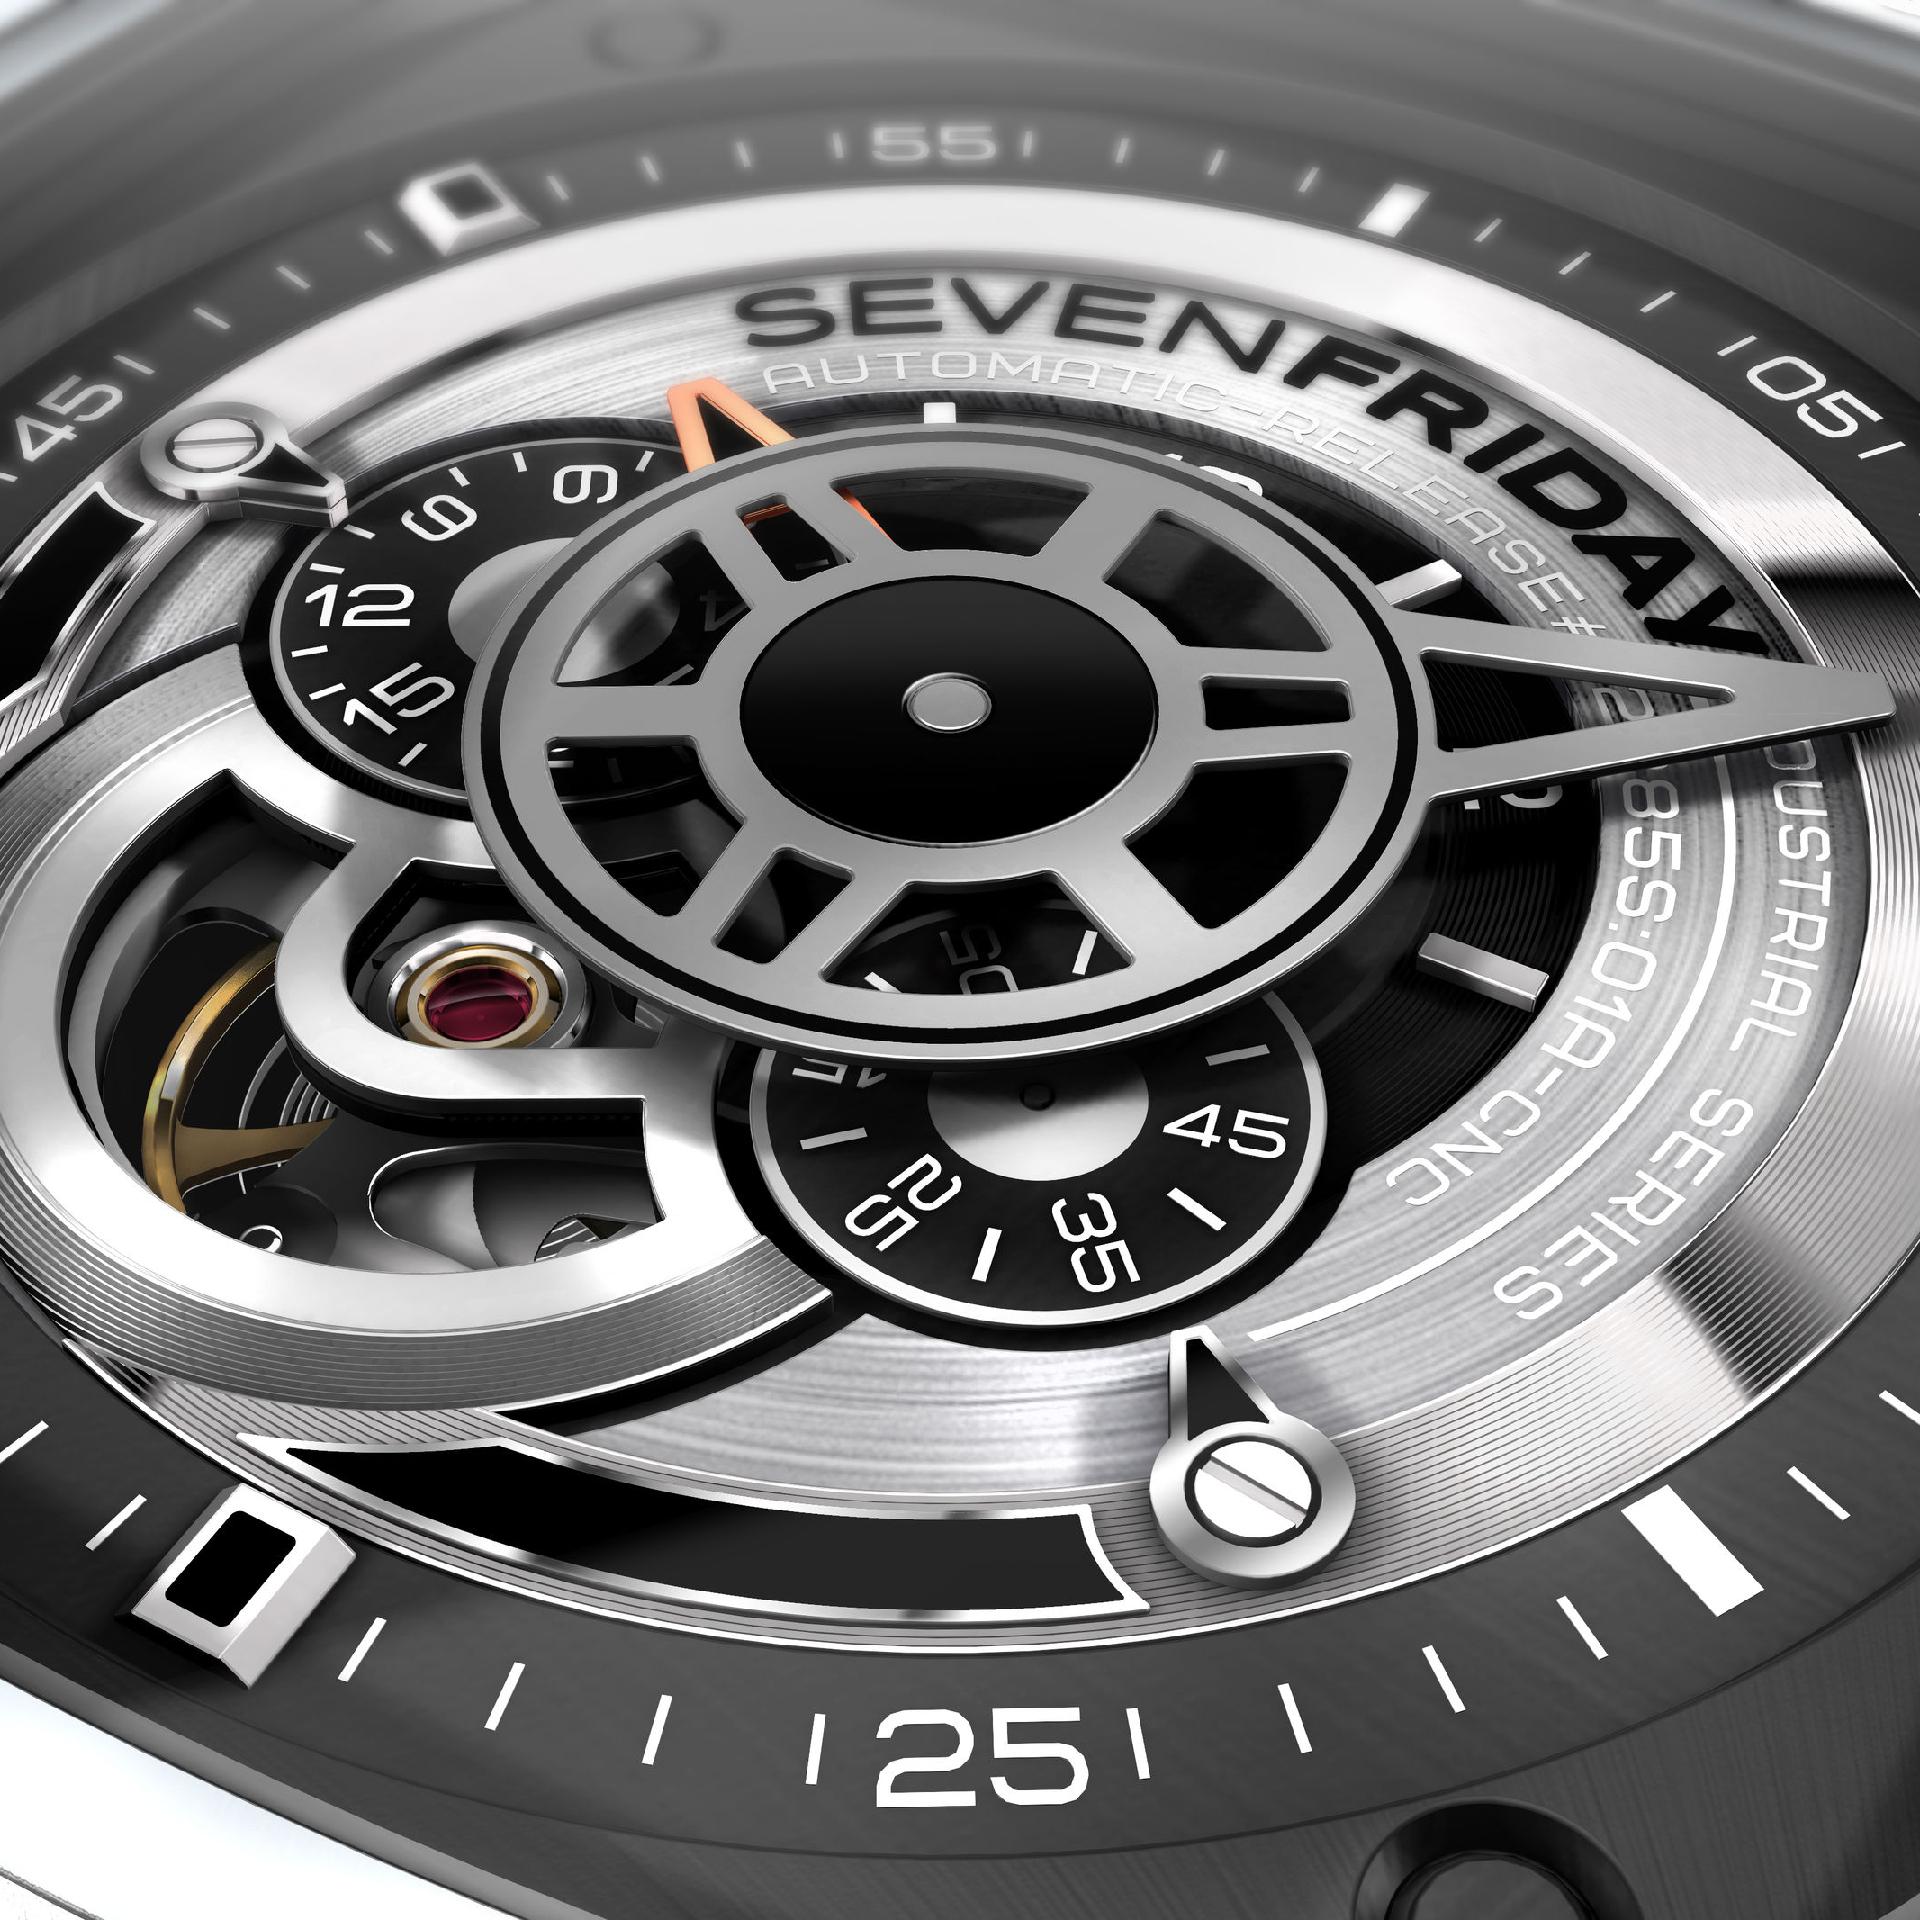 Sevenfriday P1 Industrial / Automatikuhr / Miyota Uhrwerk